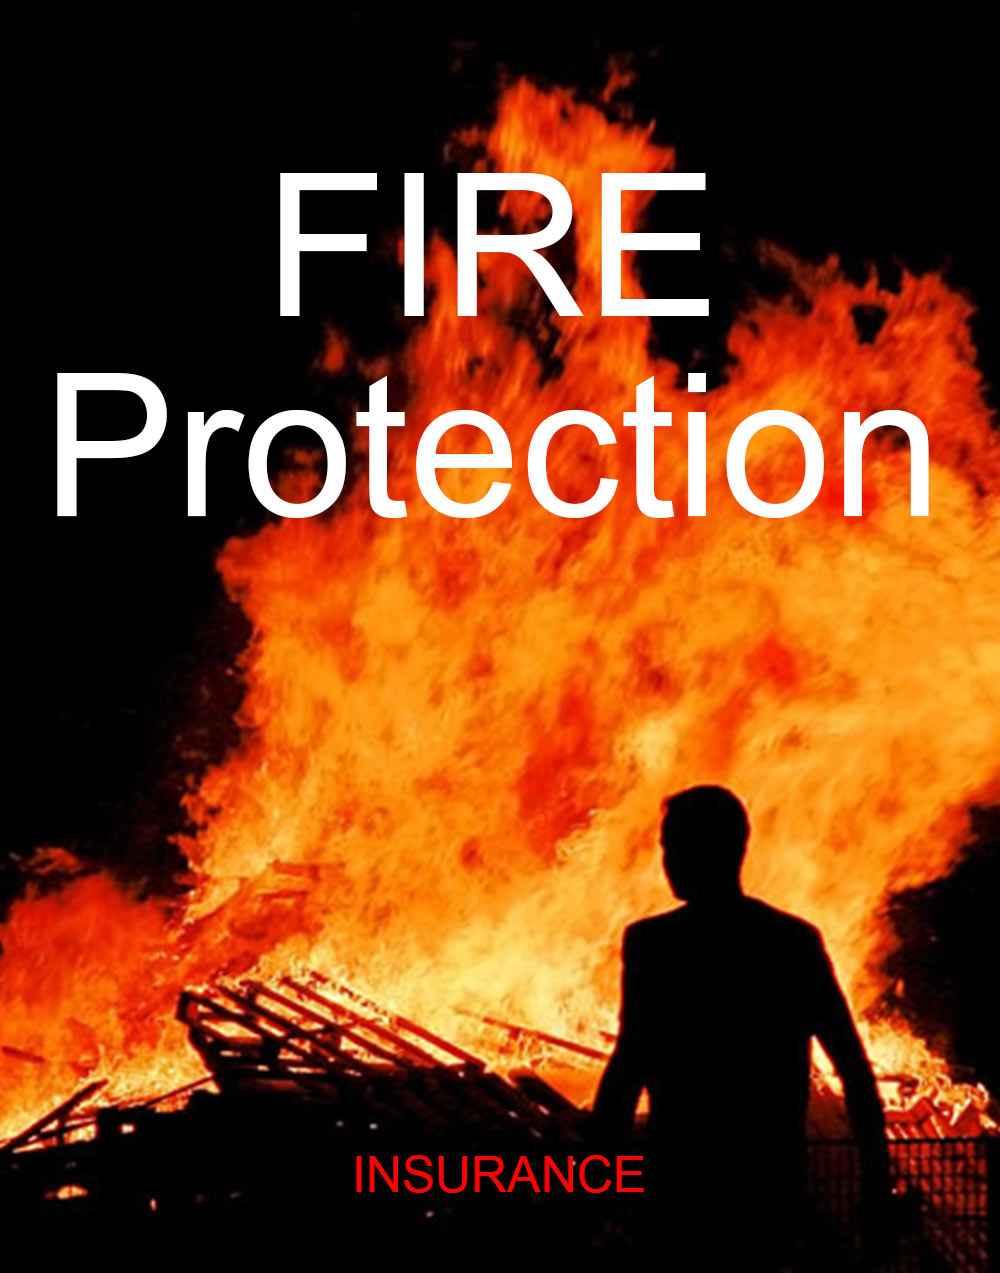 fire insurance exchange photo - 1